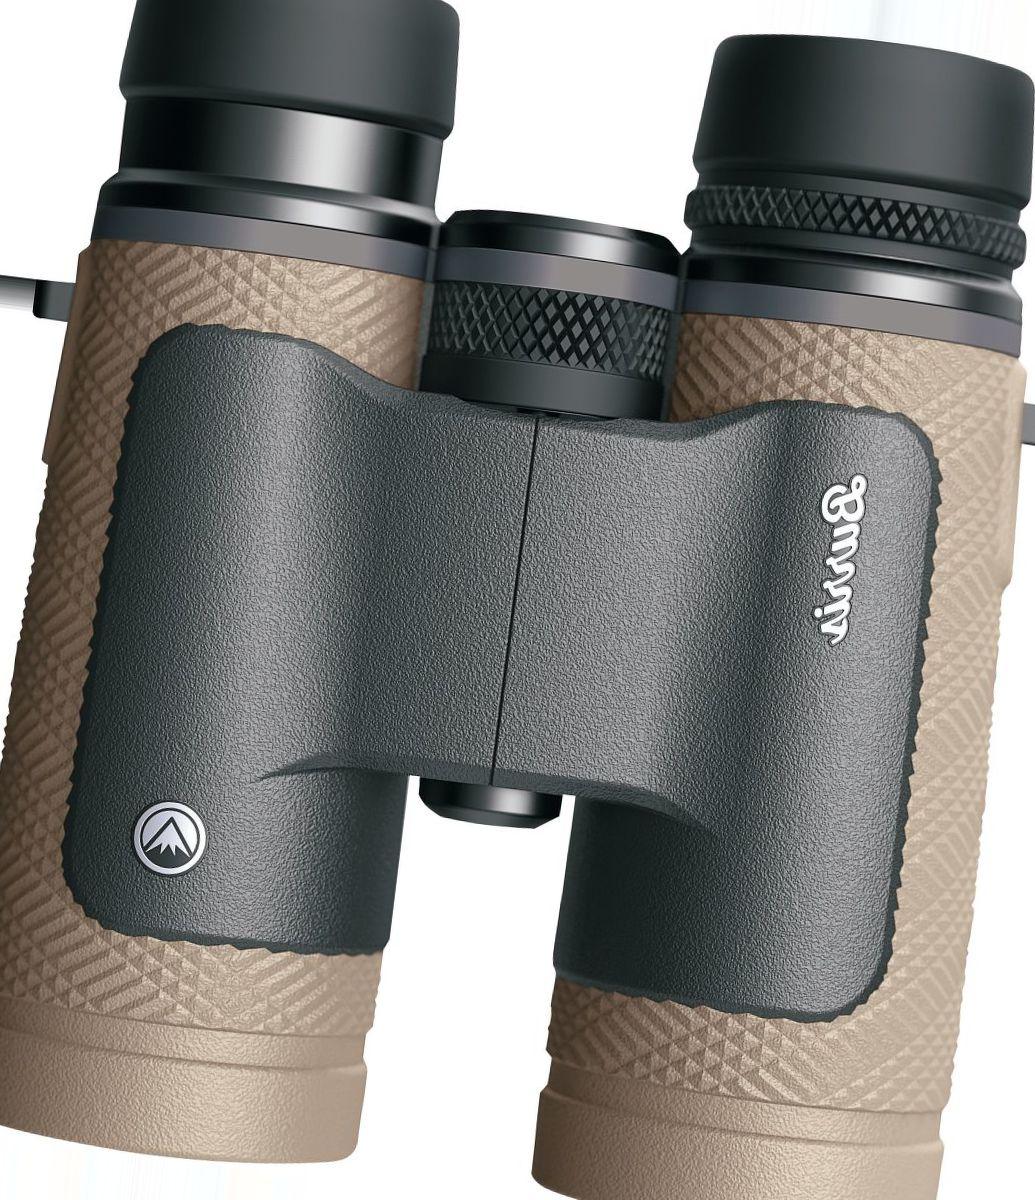 Burris Droptine Binocular